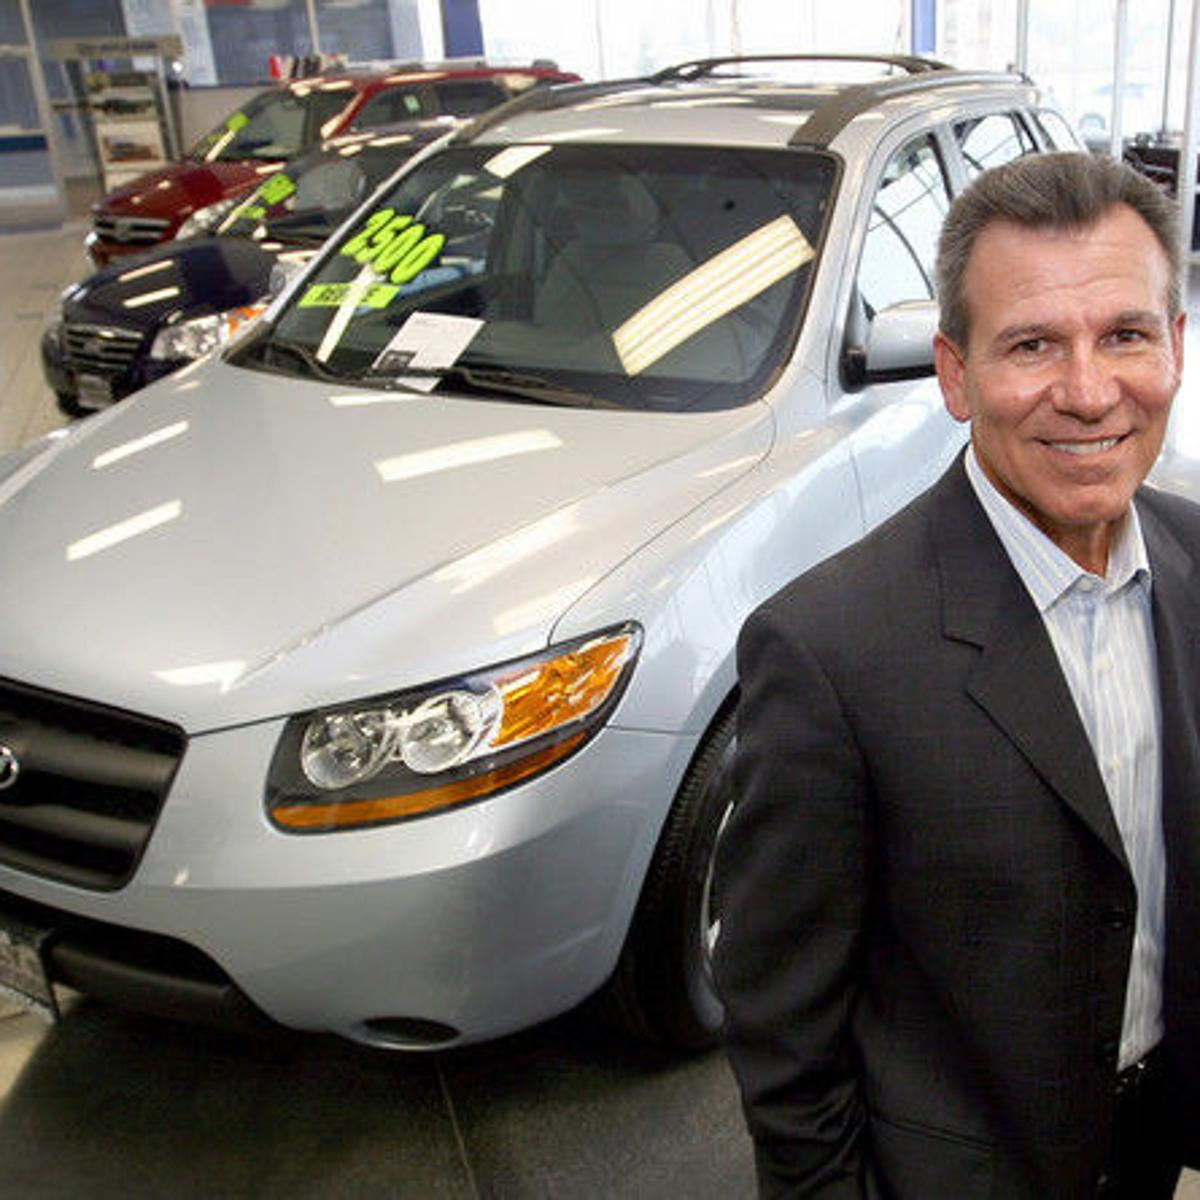 Bakersfield Car Dealers >> Local Car Dealer Jose Arredondo Is Killed News